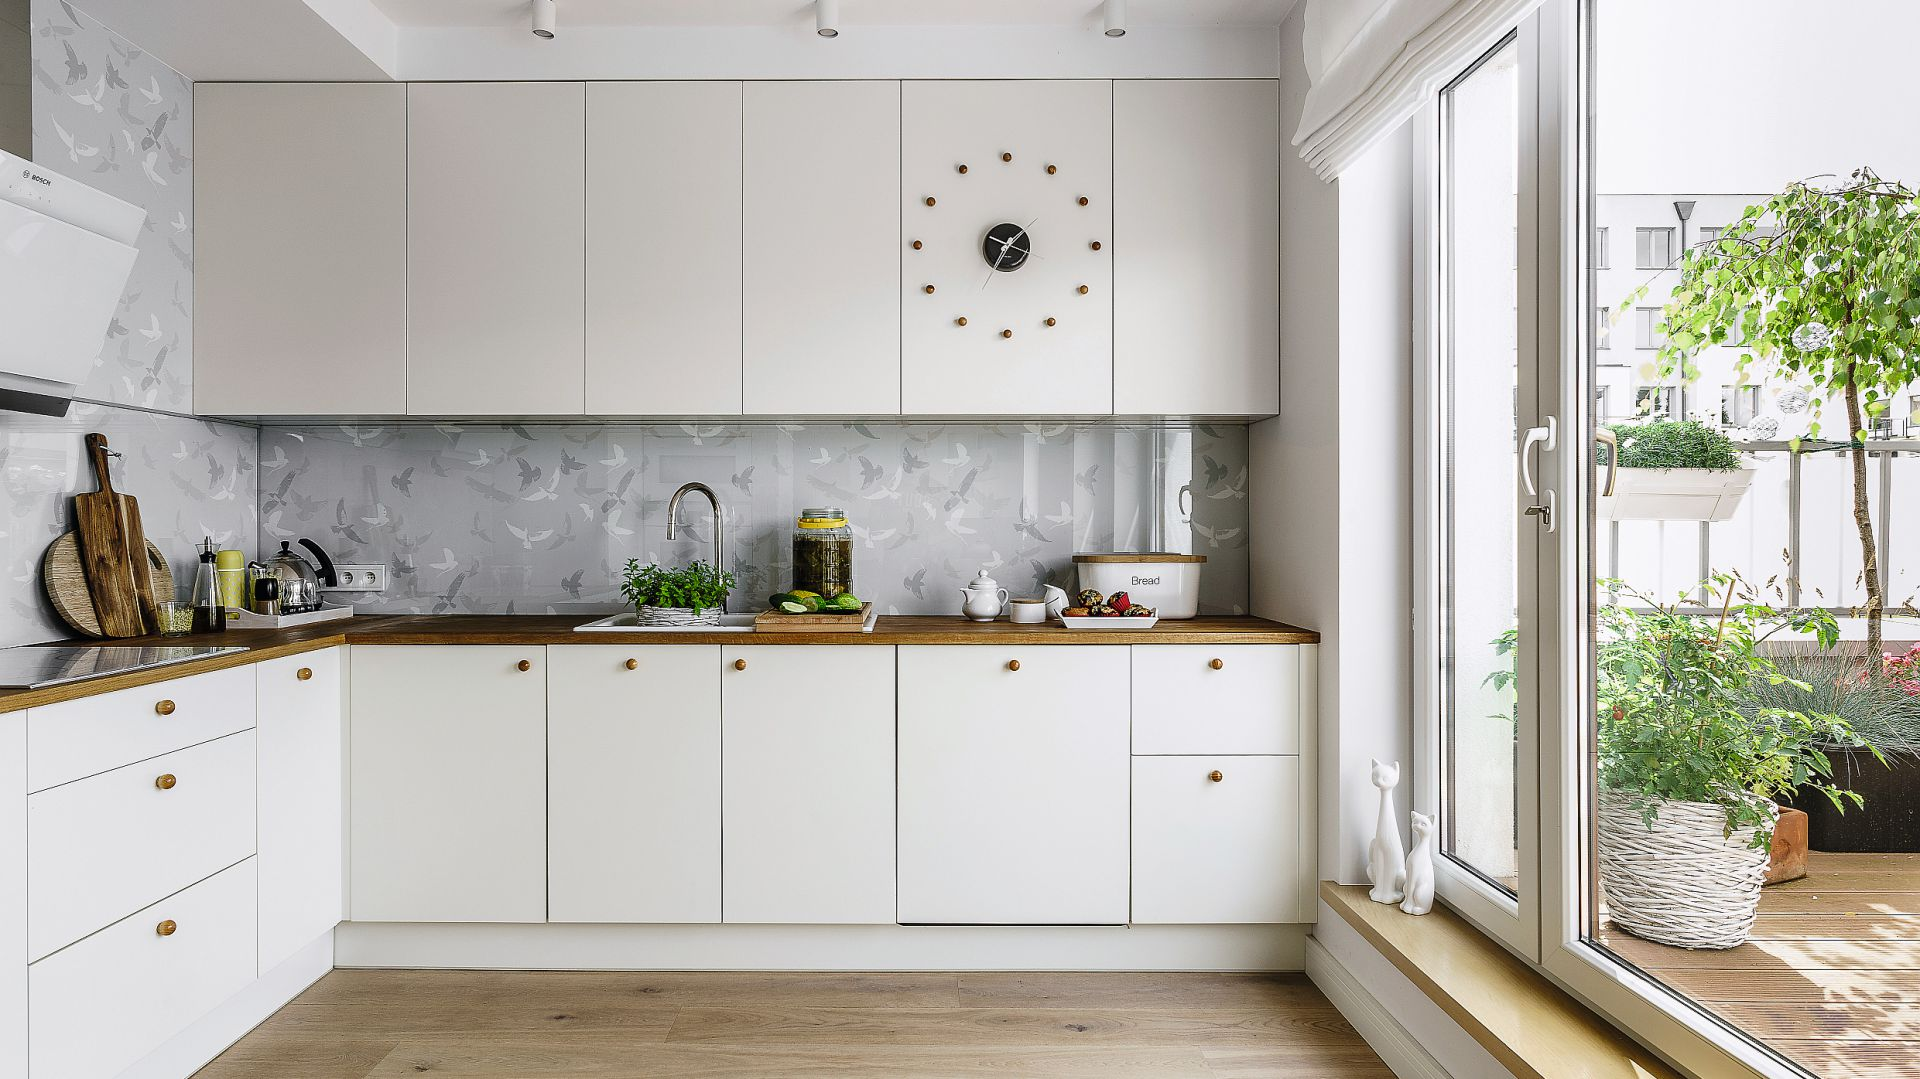 Piękna biała kuchnia. Projekt: Joanna Morkowska-Saj. Fot. Foto&Mohito